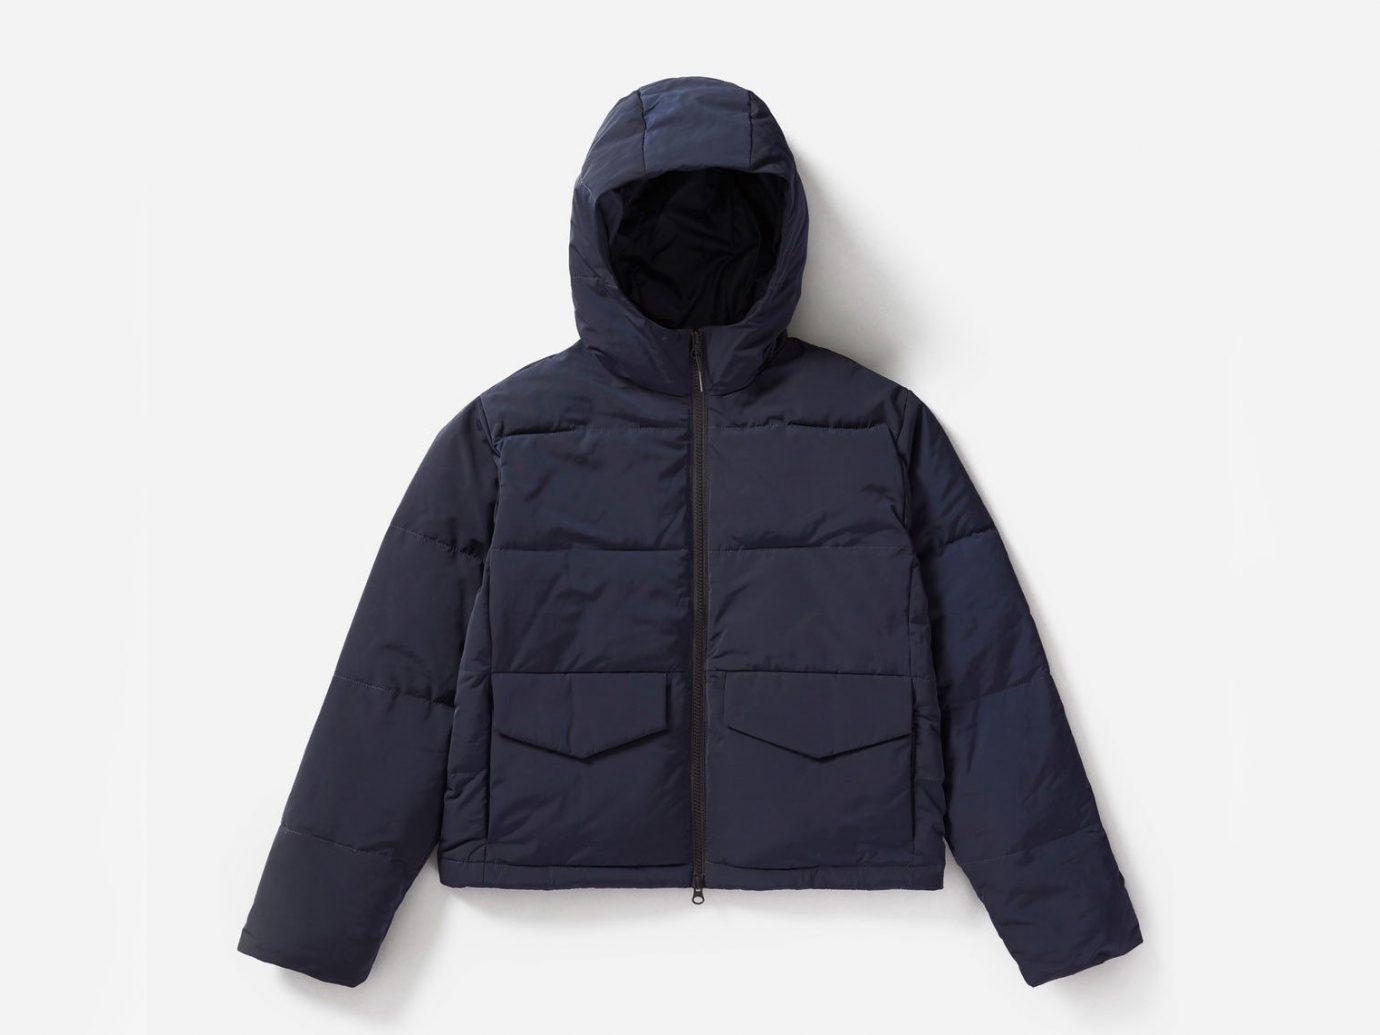 City NYC Style + Design Travel Shop hood jacket clothing product outerwear hoodie sweatshirt product design electric blue polar fleece